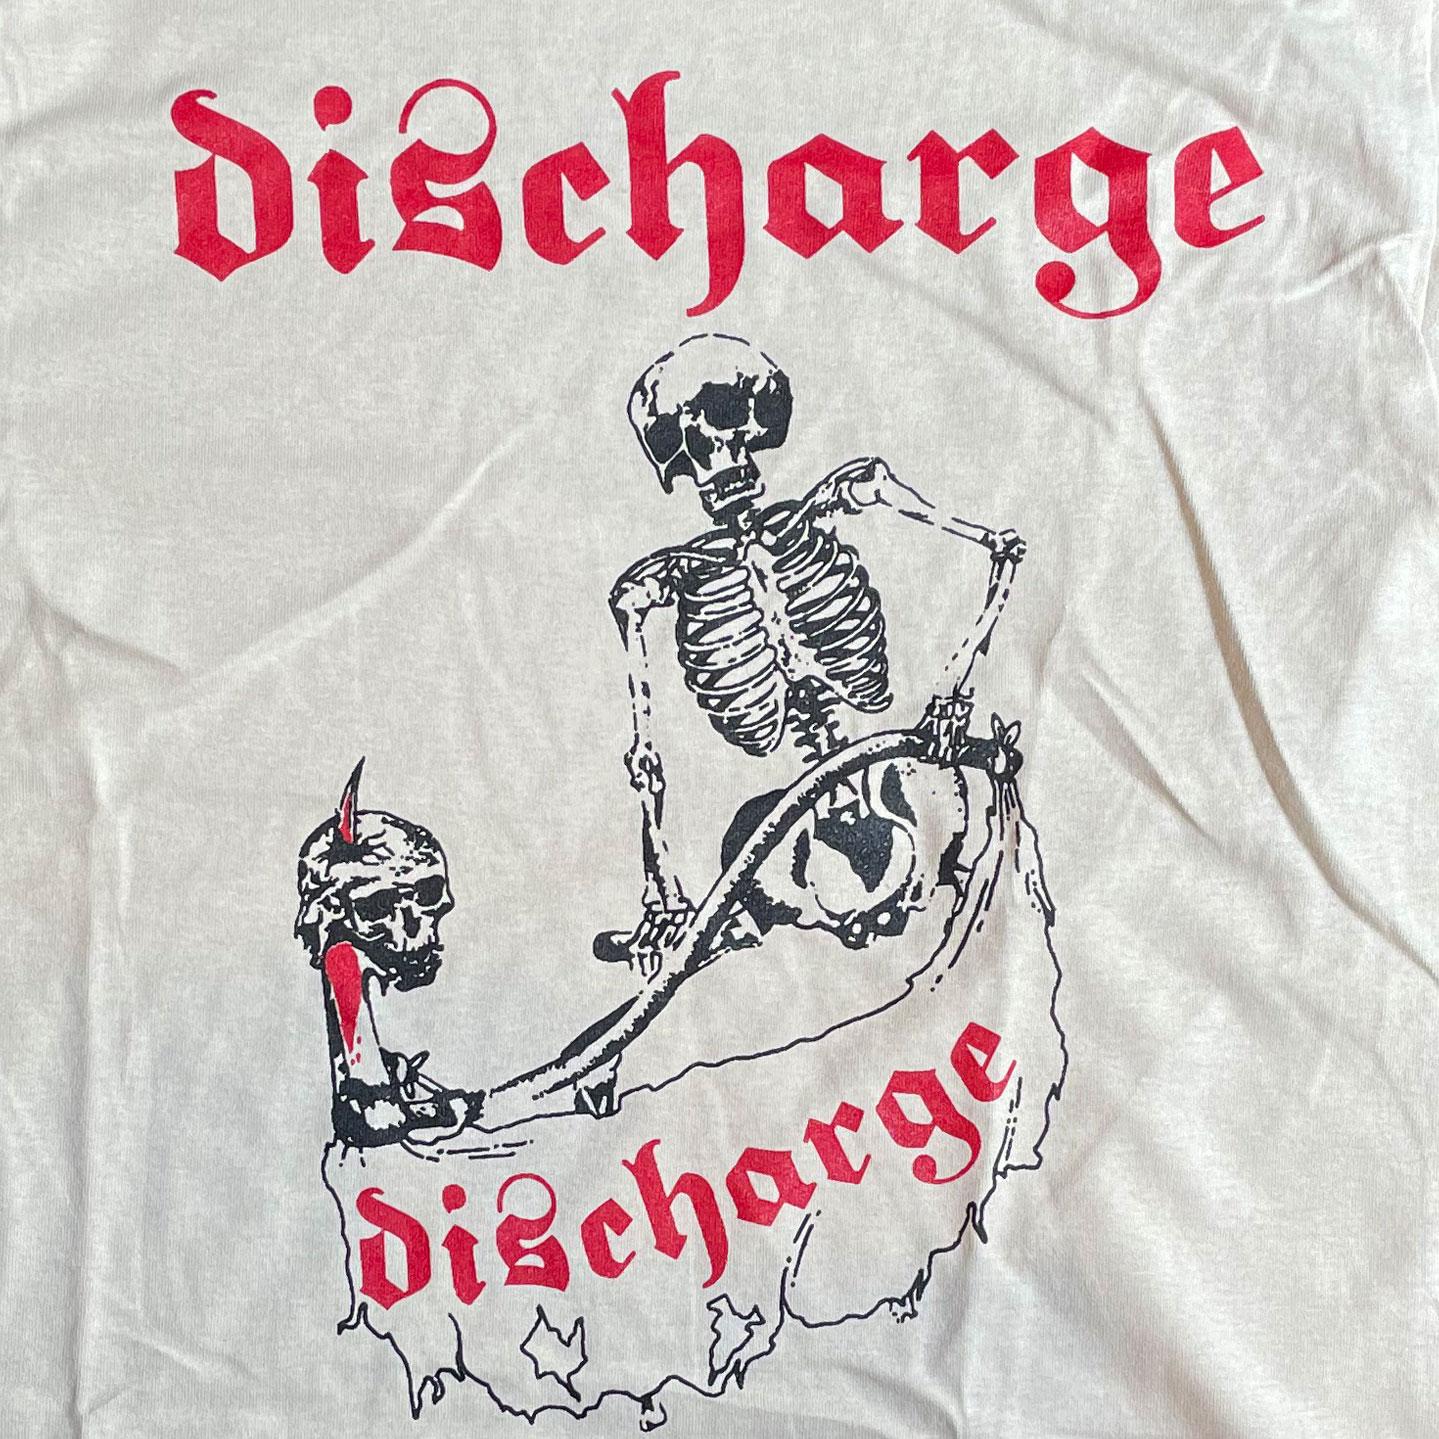 DISCHARGE Tシャツ SKULL オフィシャル!